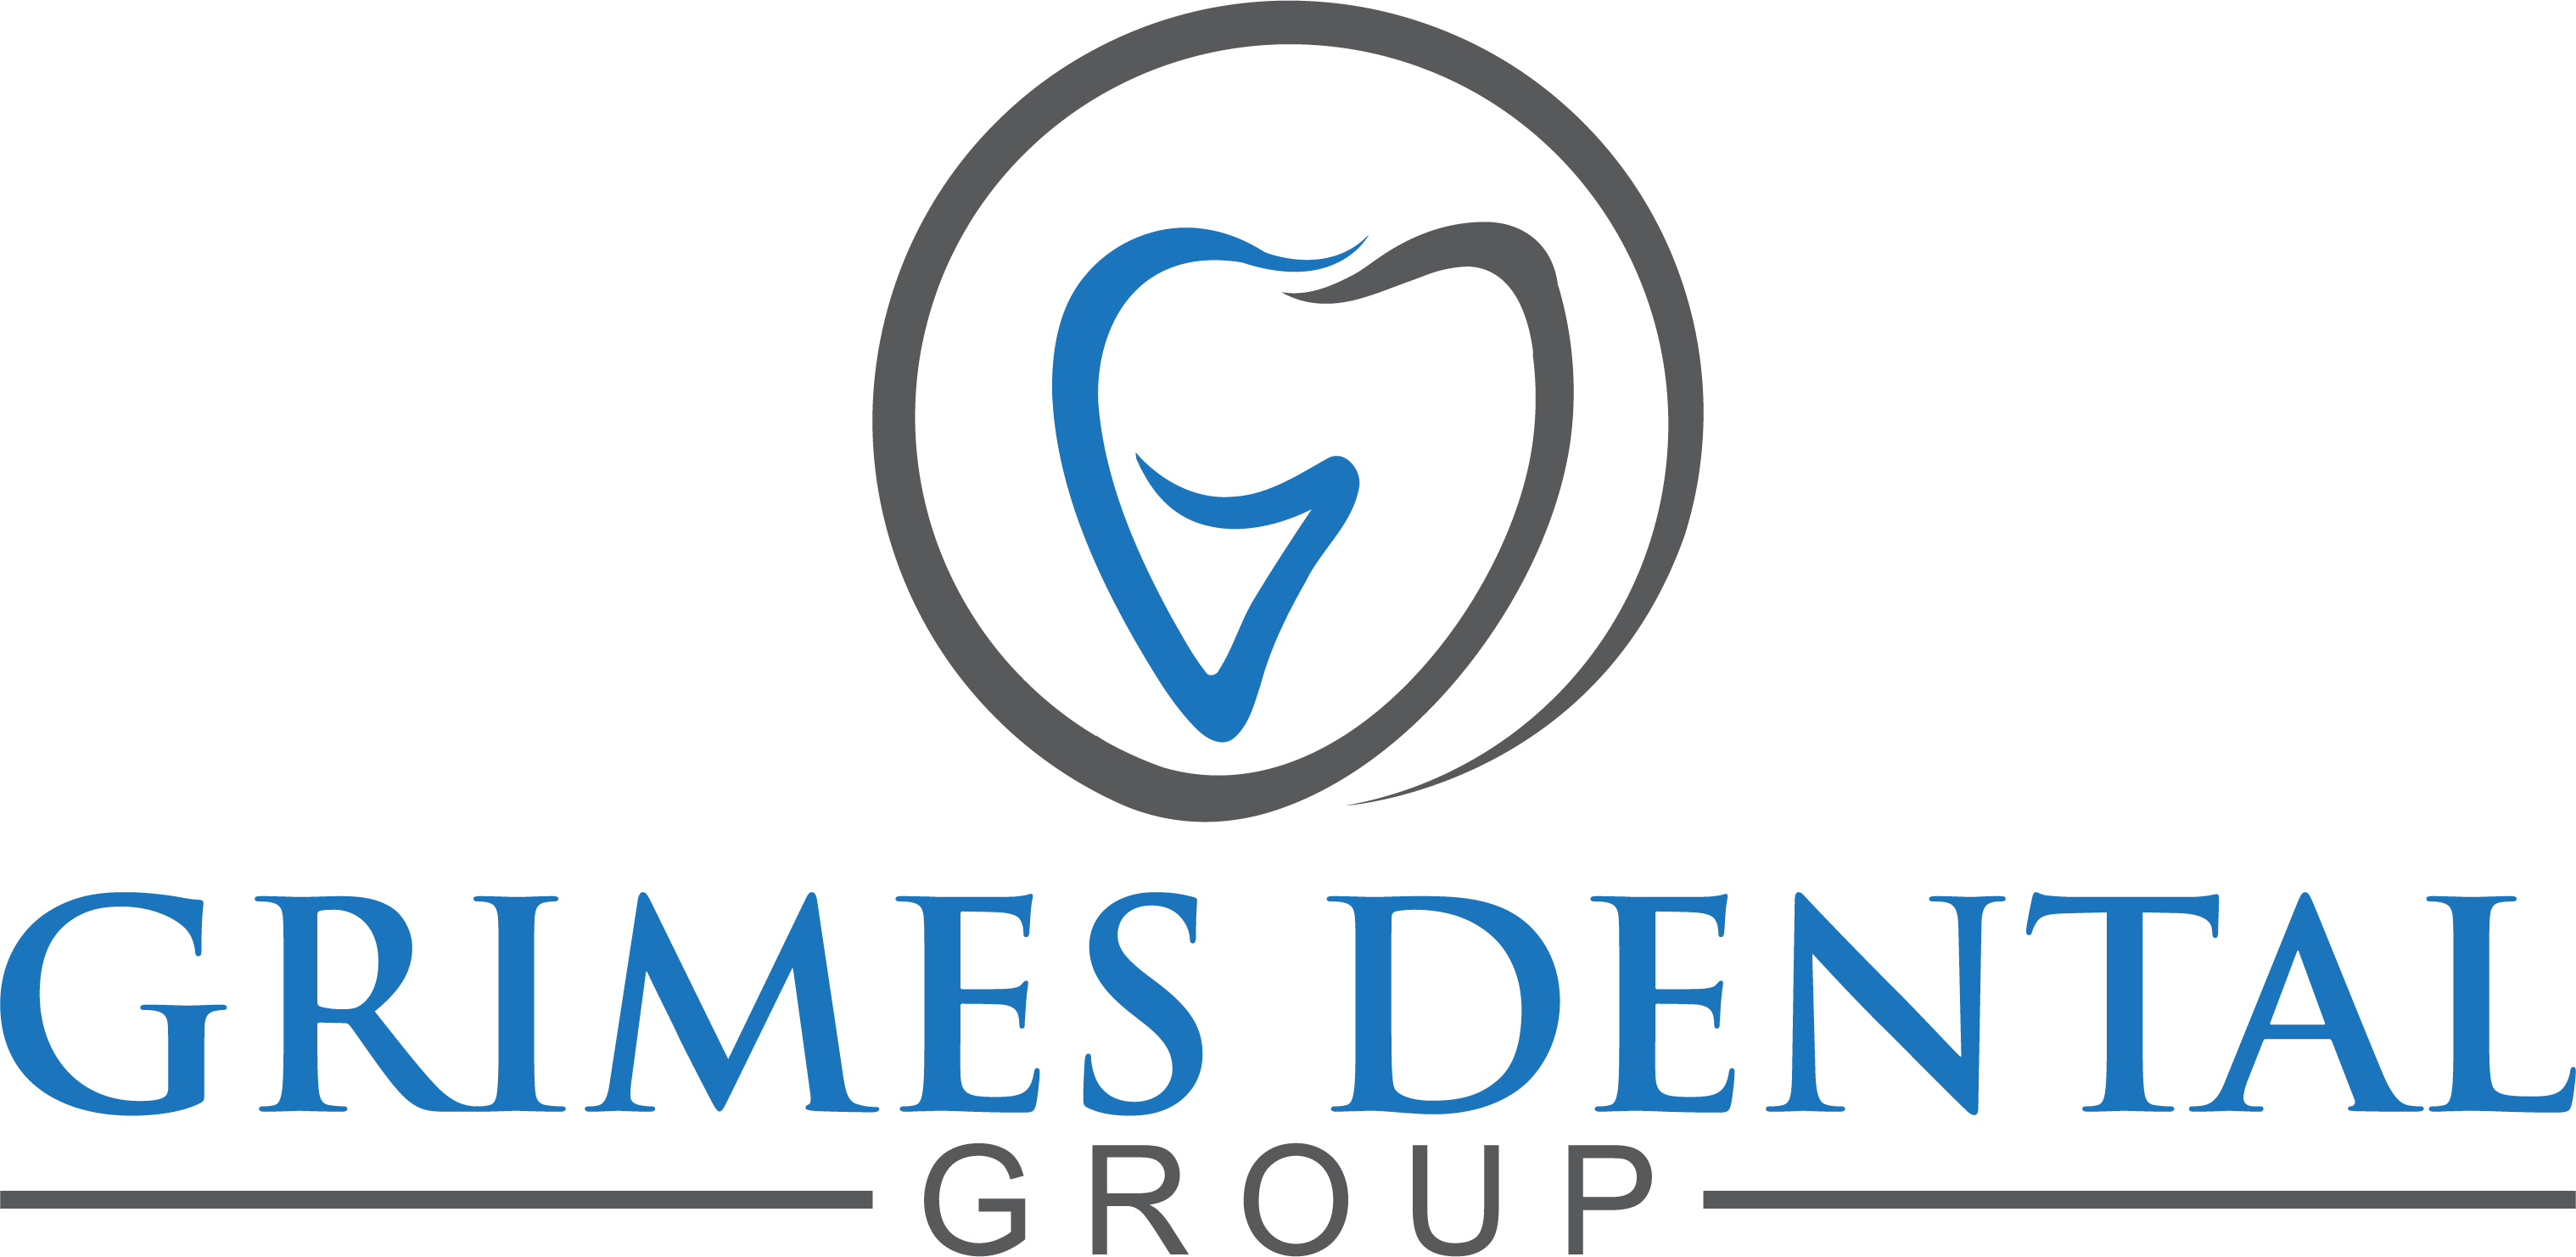 Grimes Dental Group